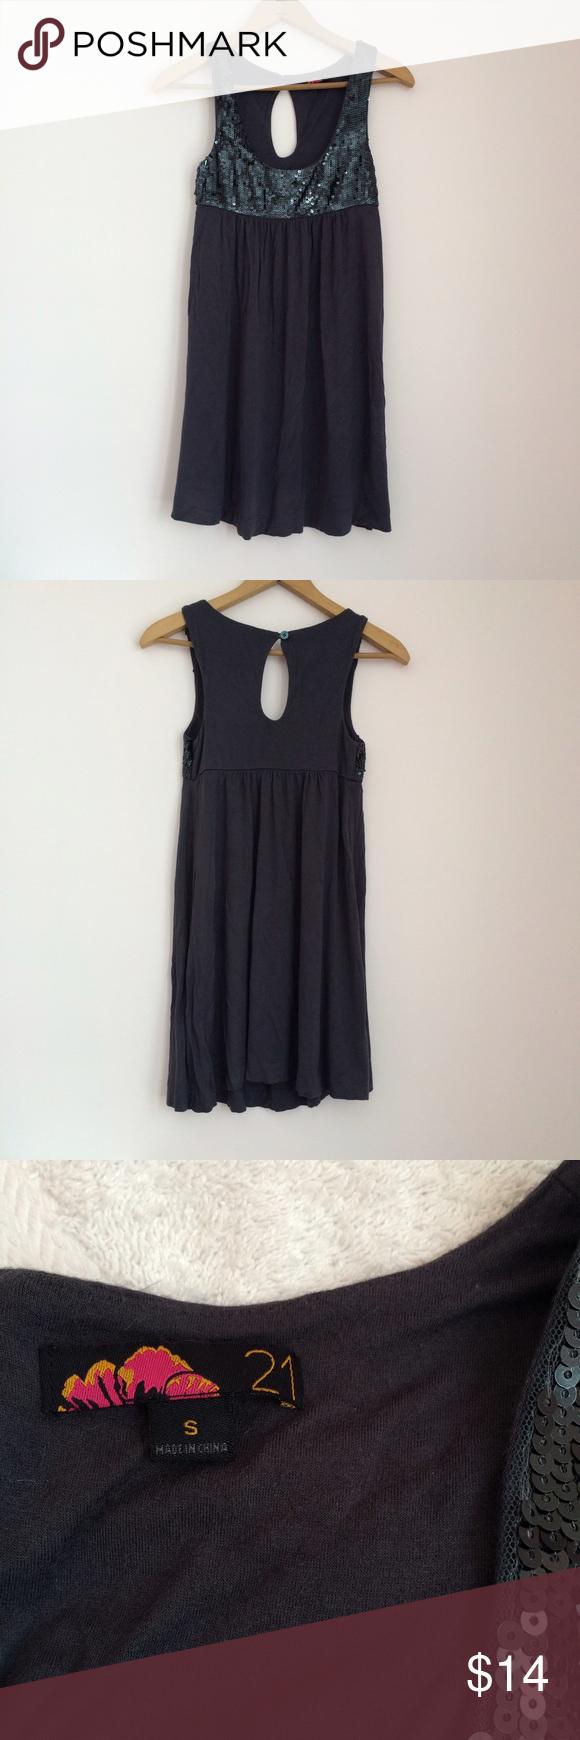 Sequin Babydoll Dress